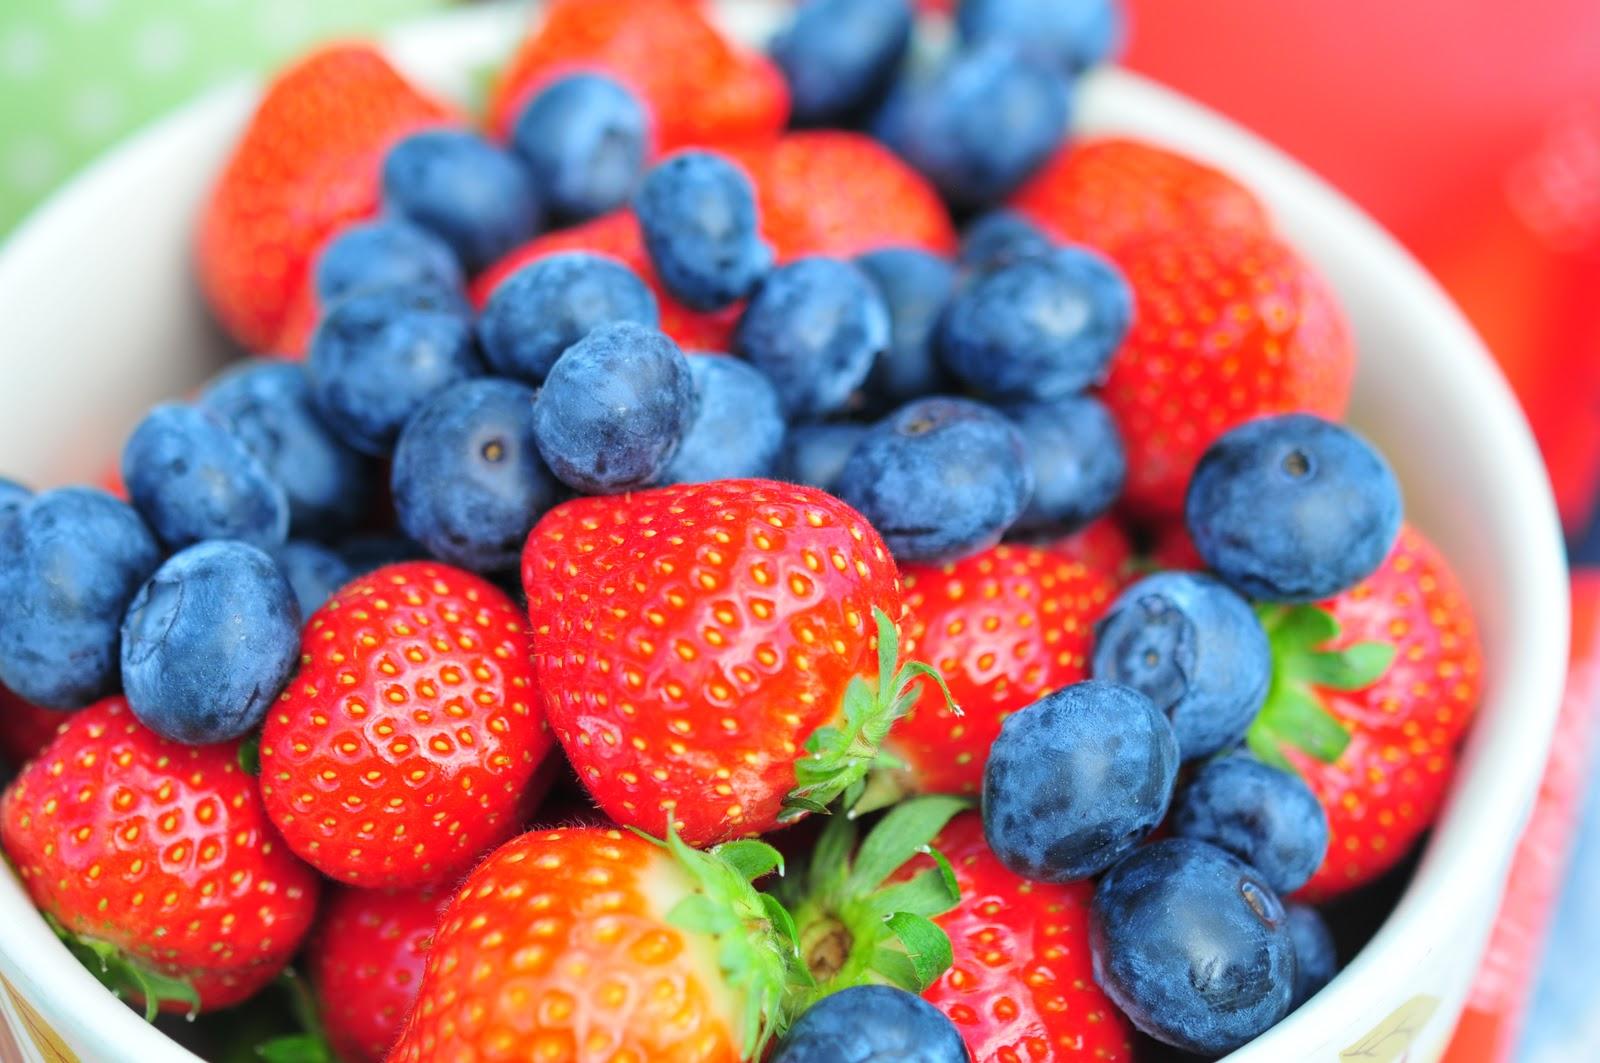 Strawberries-Blueberries-promote-heart-health